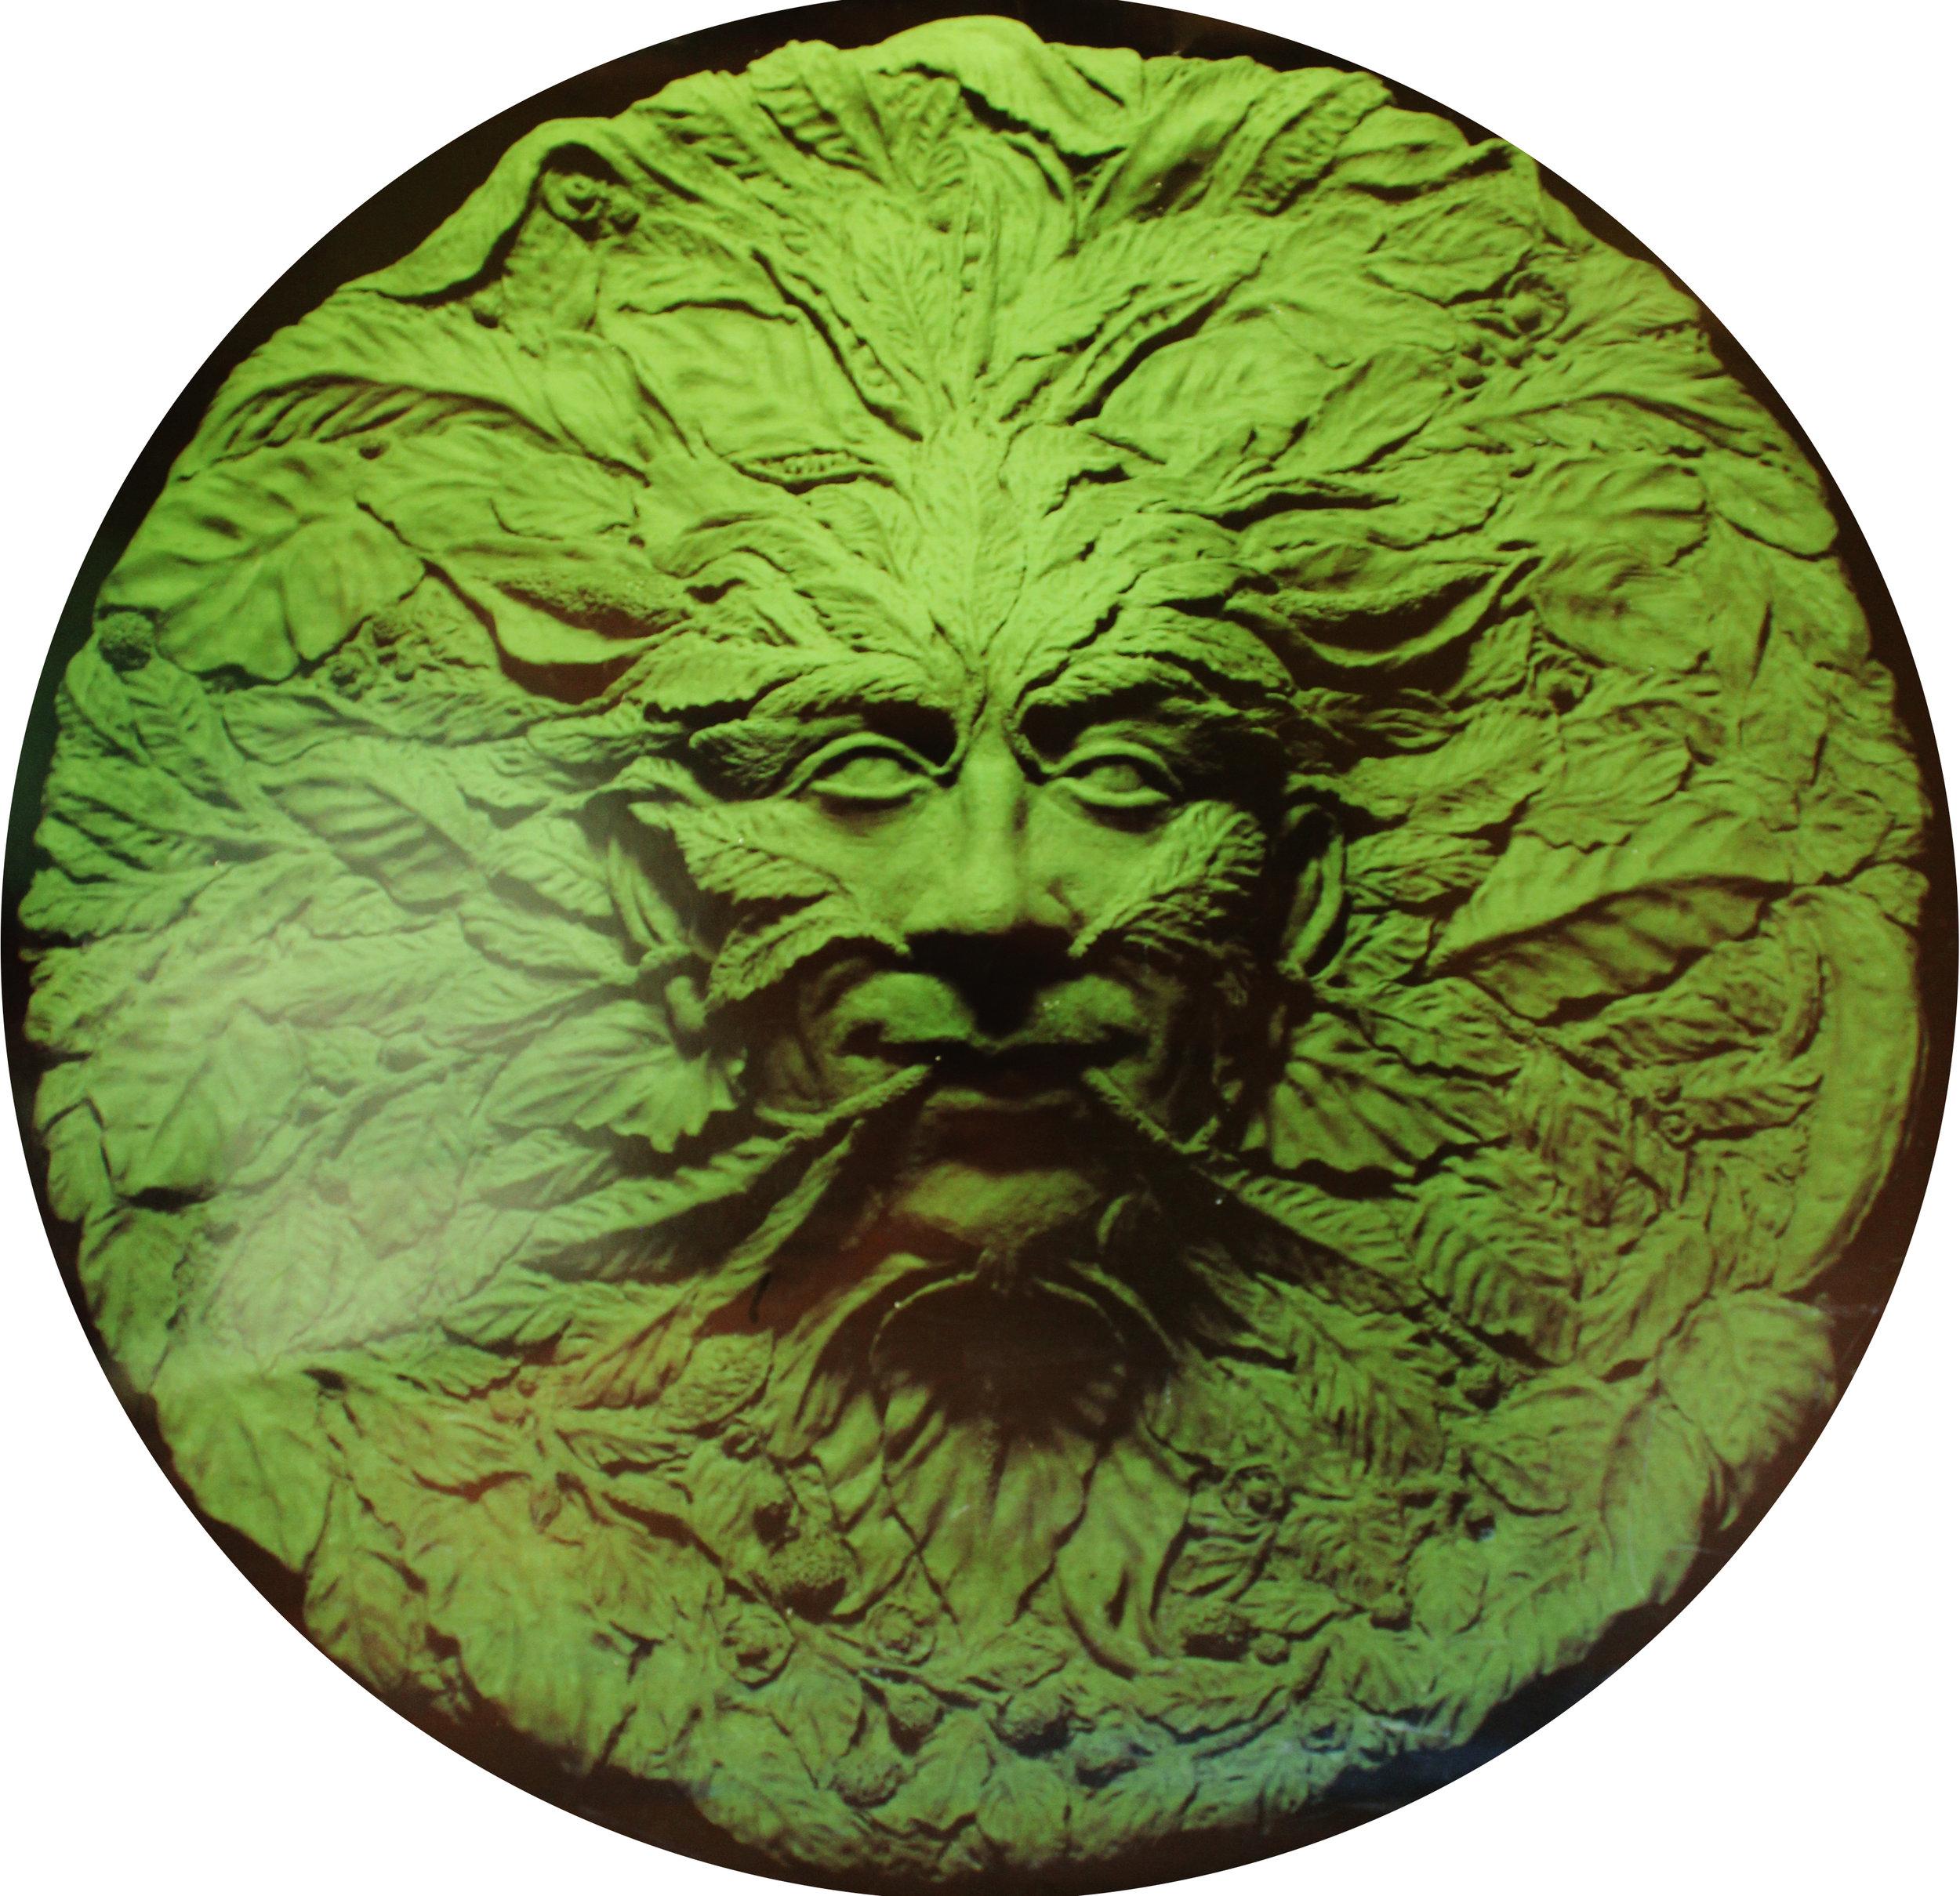 Green Man Fogli.jpg